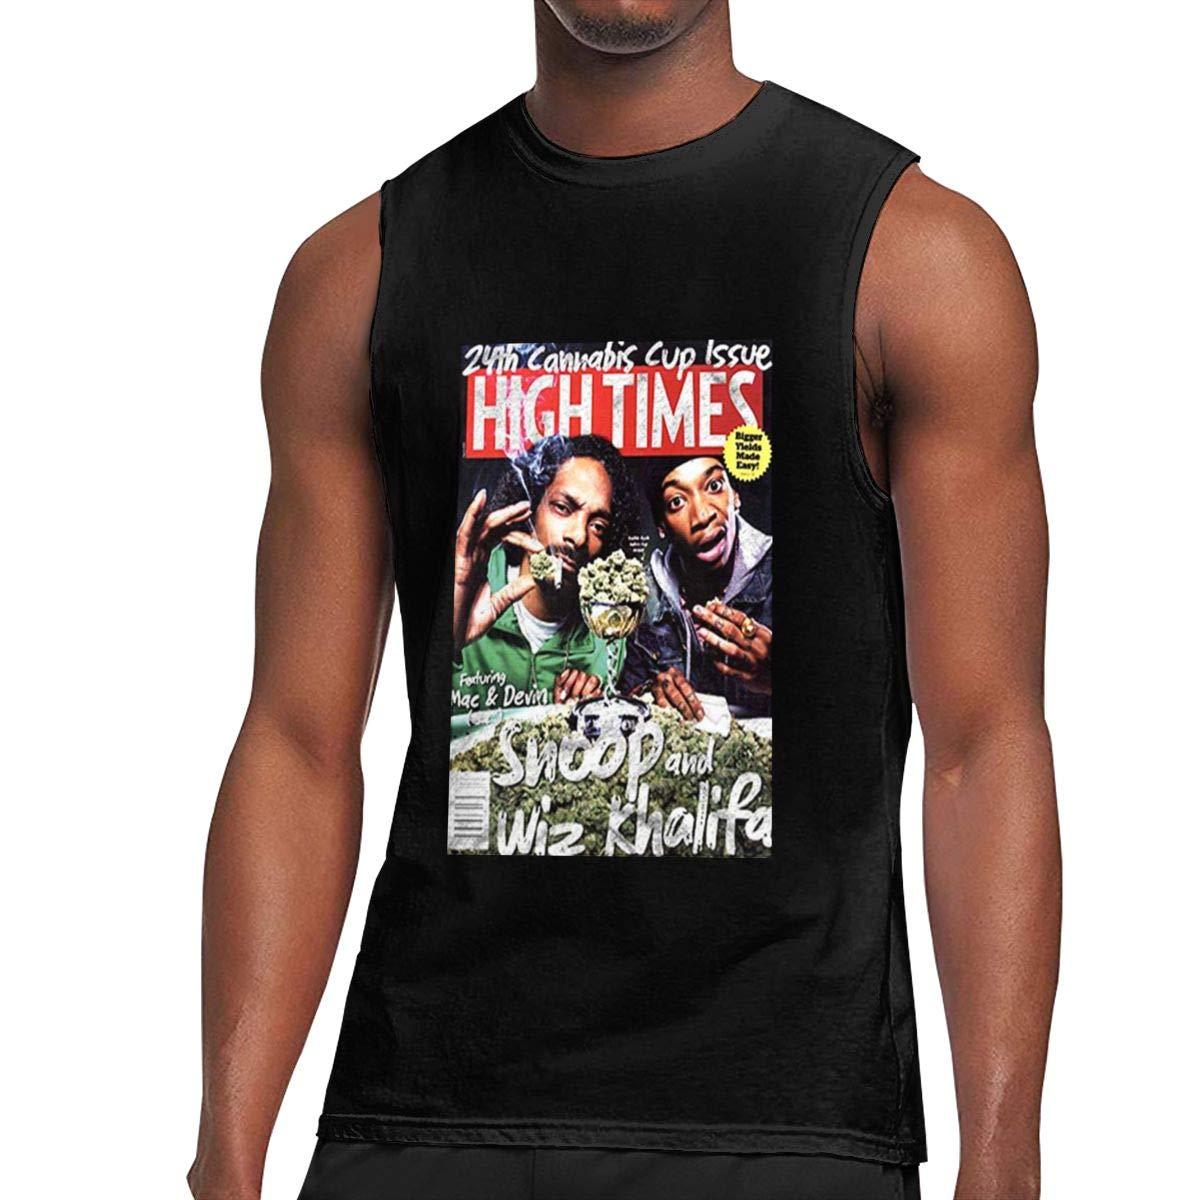 Seuriamin Snoop Dogg Wiz Khalifa Kush Weed Ganja Sativa Indica S Funny Athletic Sleeveless